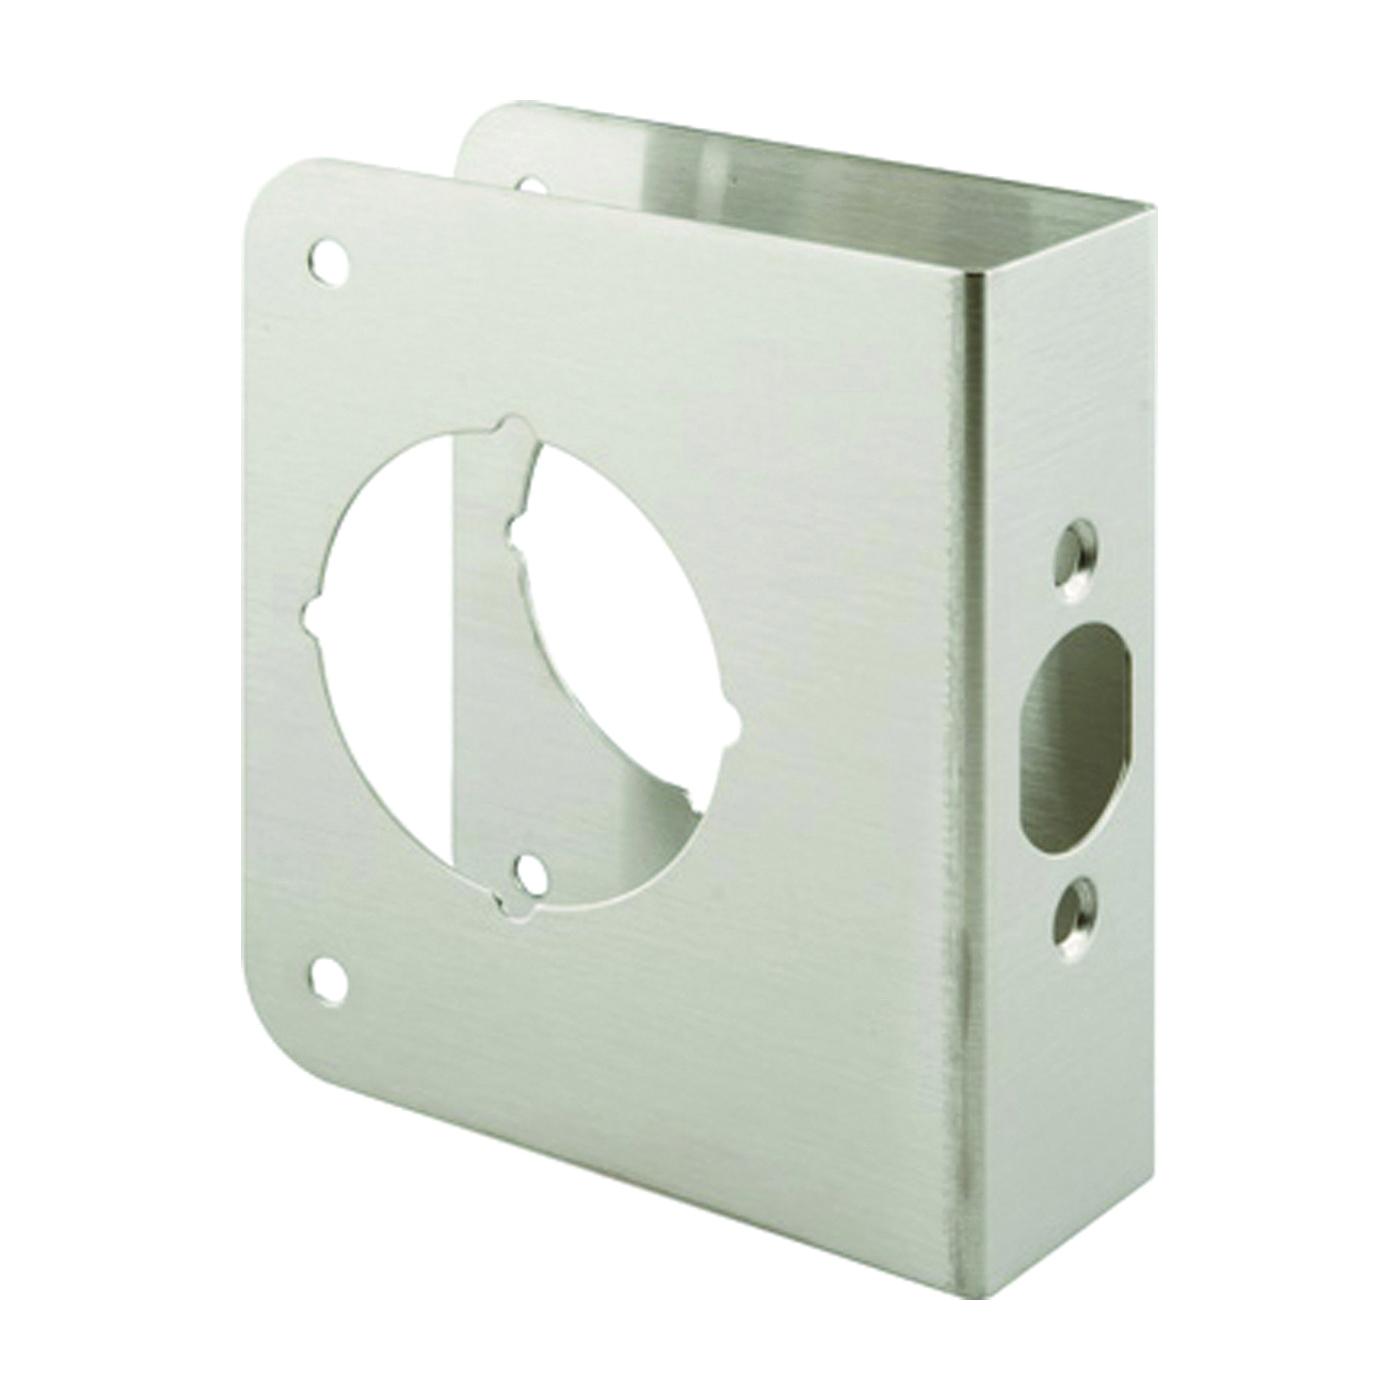 Picture of Prime-Line U 9590 Lock and Door Reinforcer, 2-3/8 in Backset, 1-3/4 in Thick Door, Stainless Steel, Stainless Steel